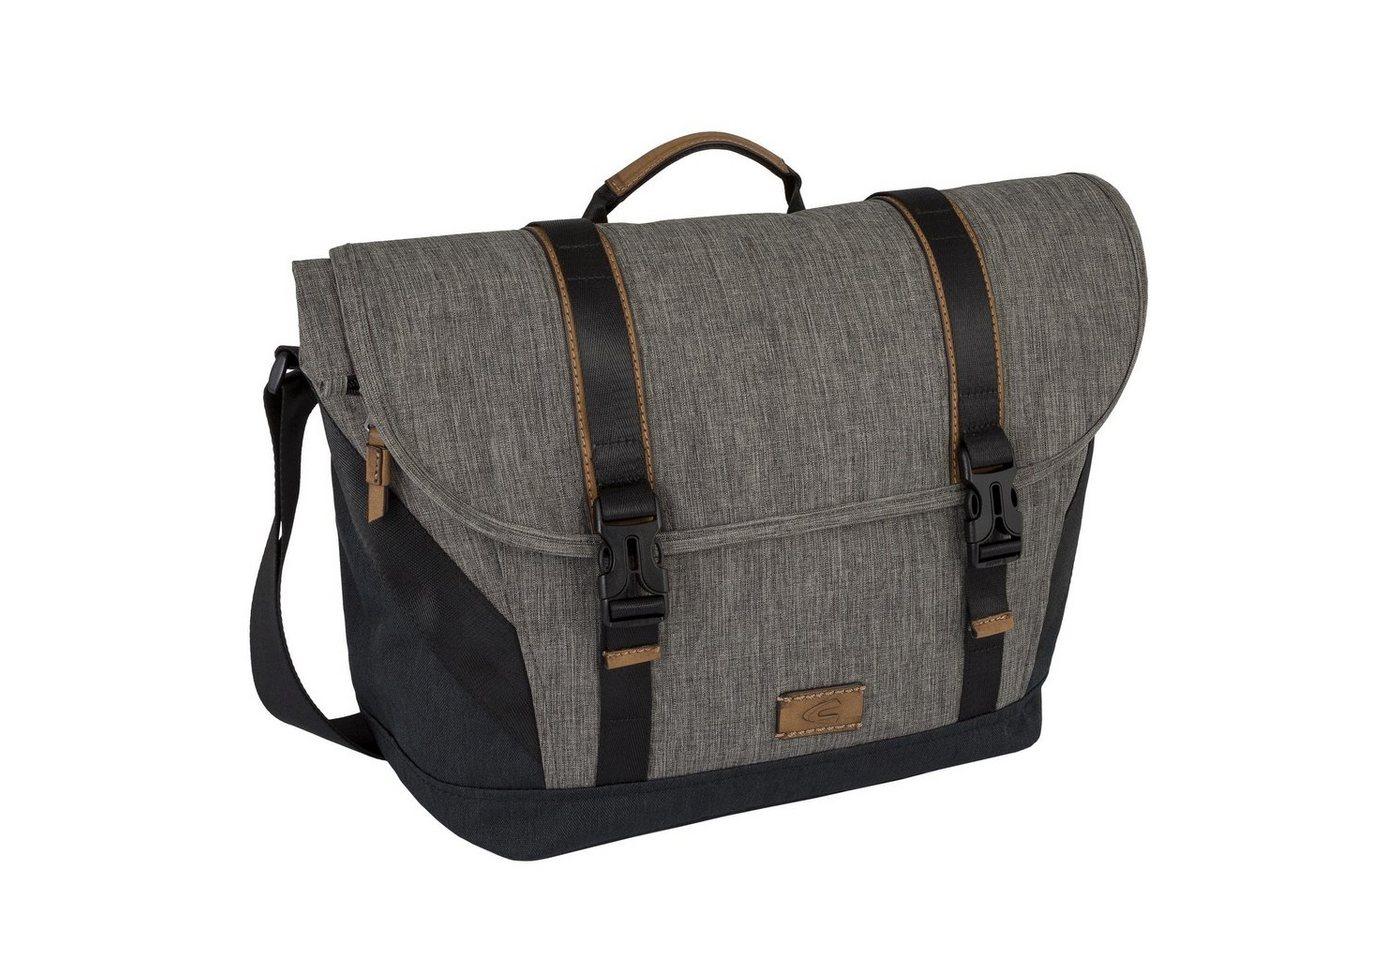 camel active Messenger Bag »INDONESIA«, mit Laptopfach | Taschen > Business Taschen > Messenger Bags | Grau | camel active